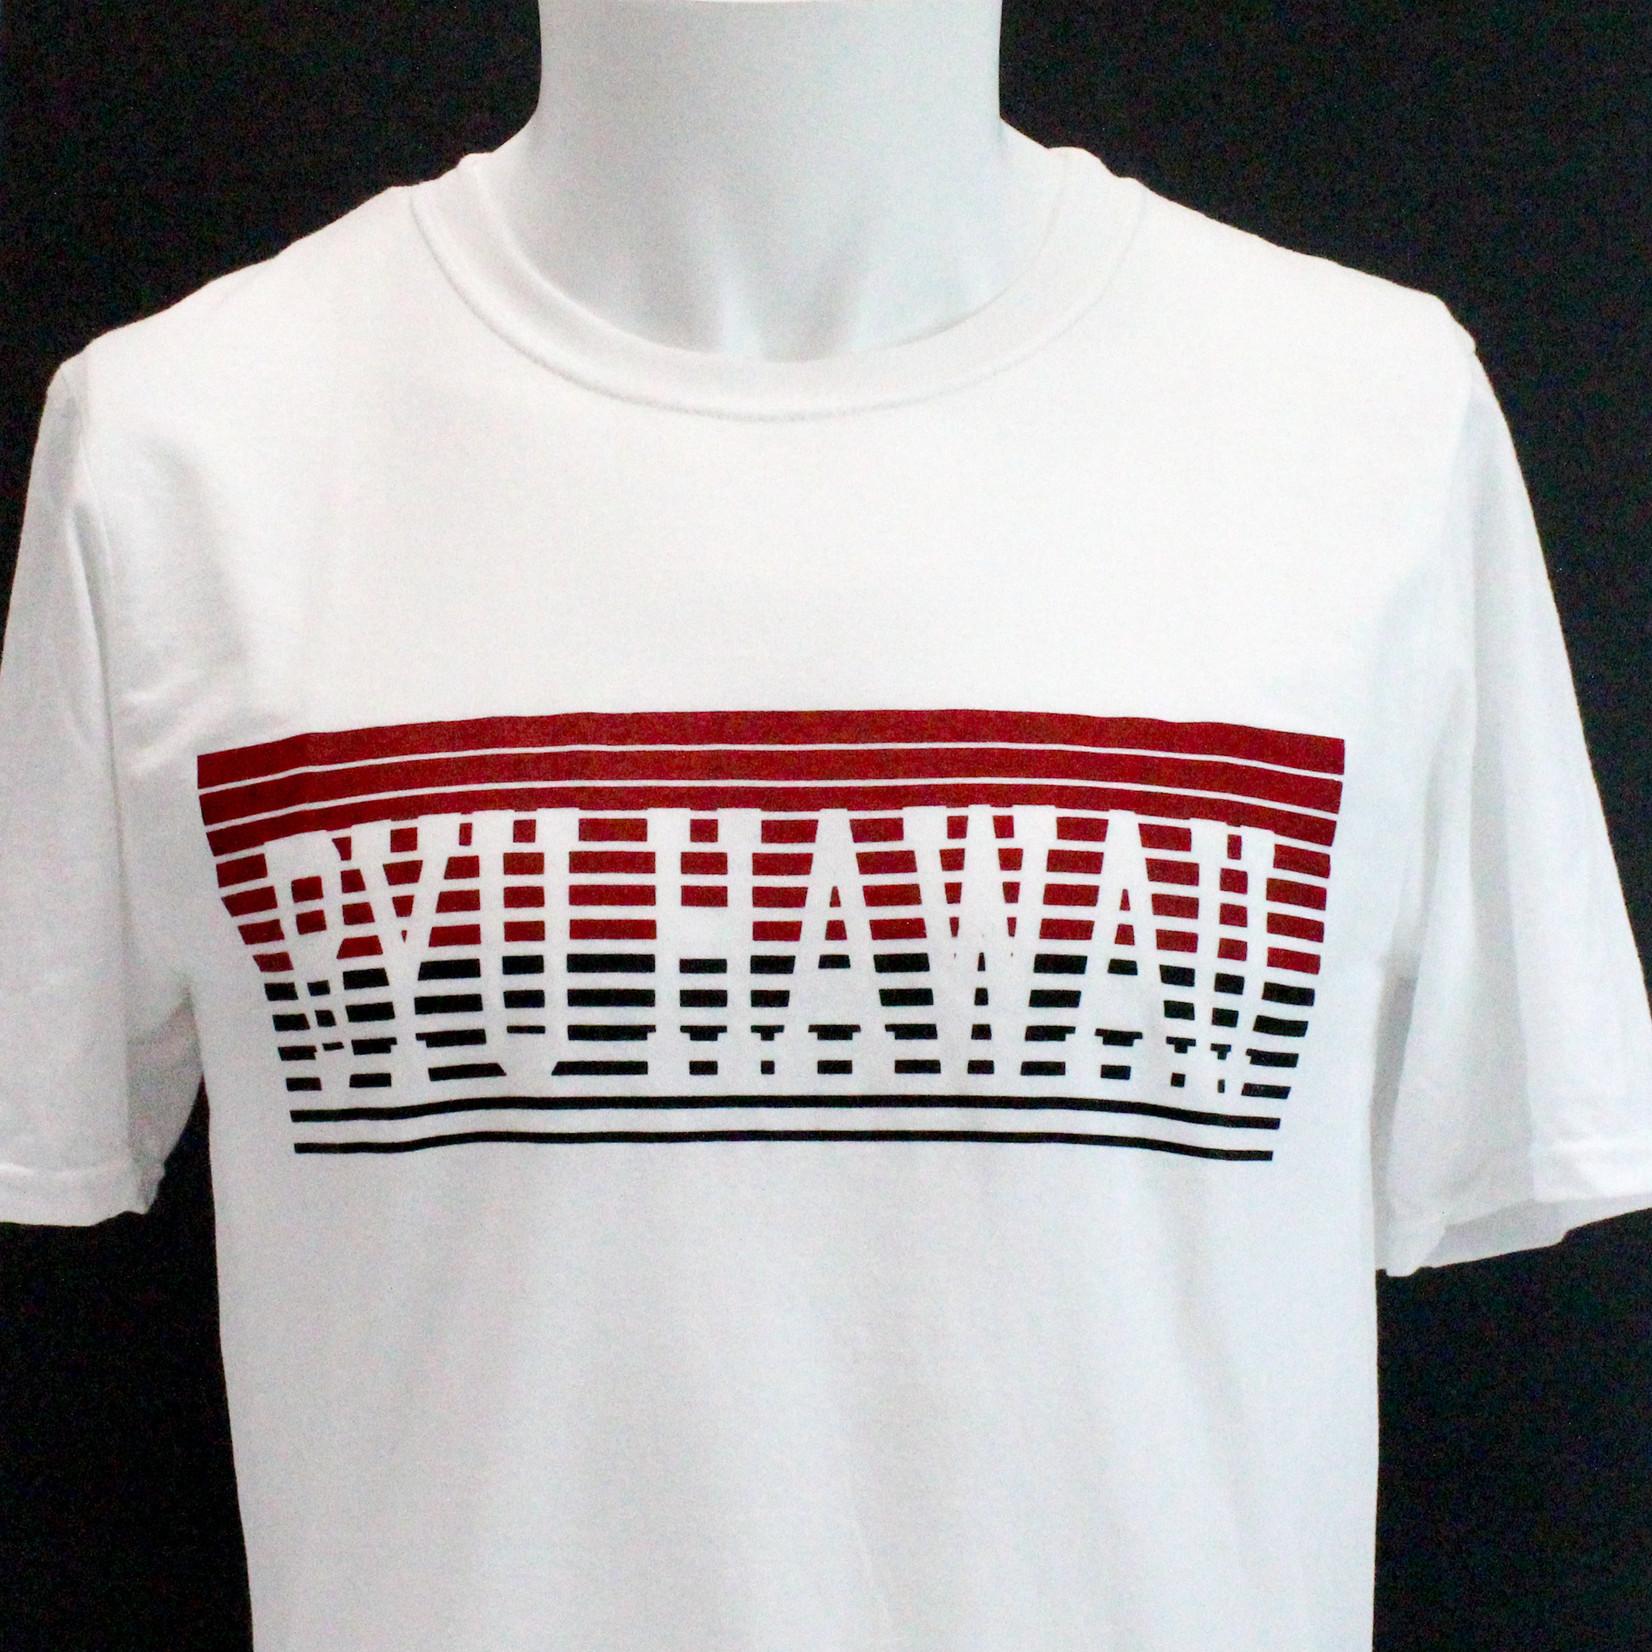 CLR BYU-Hawaii Short Sleeved Blend Tee w/ Retro Stripes